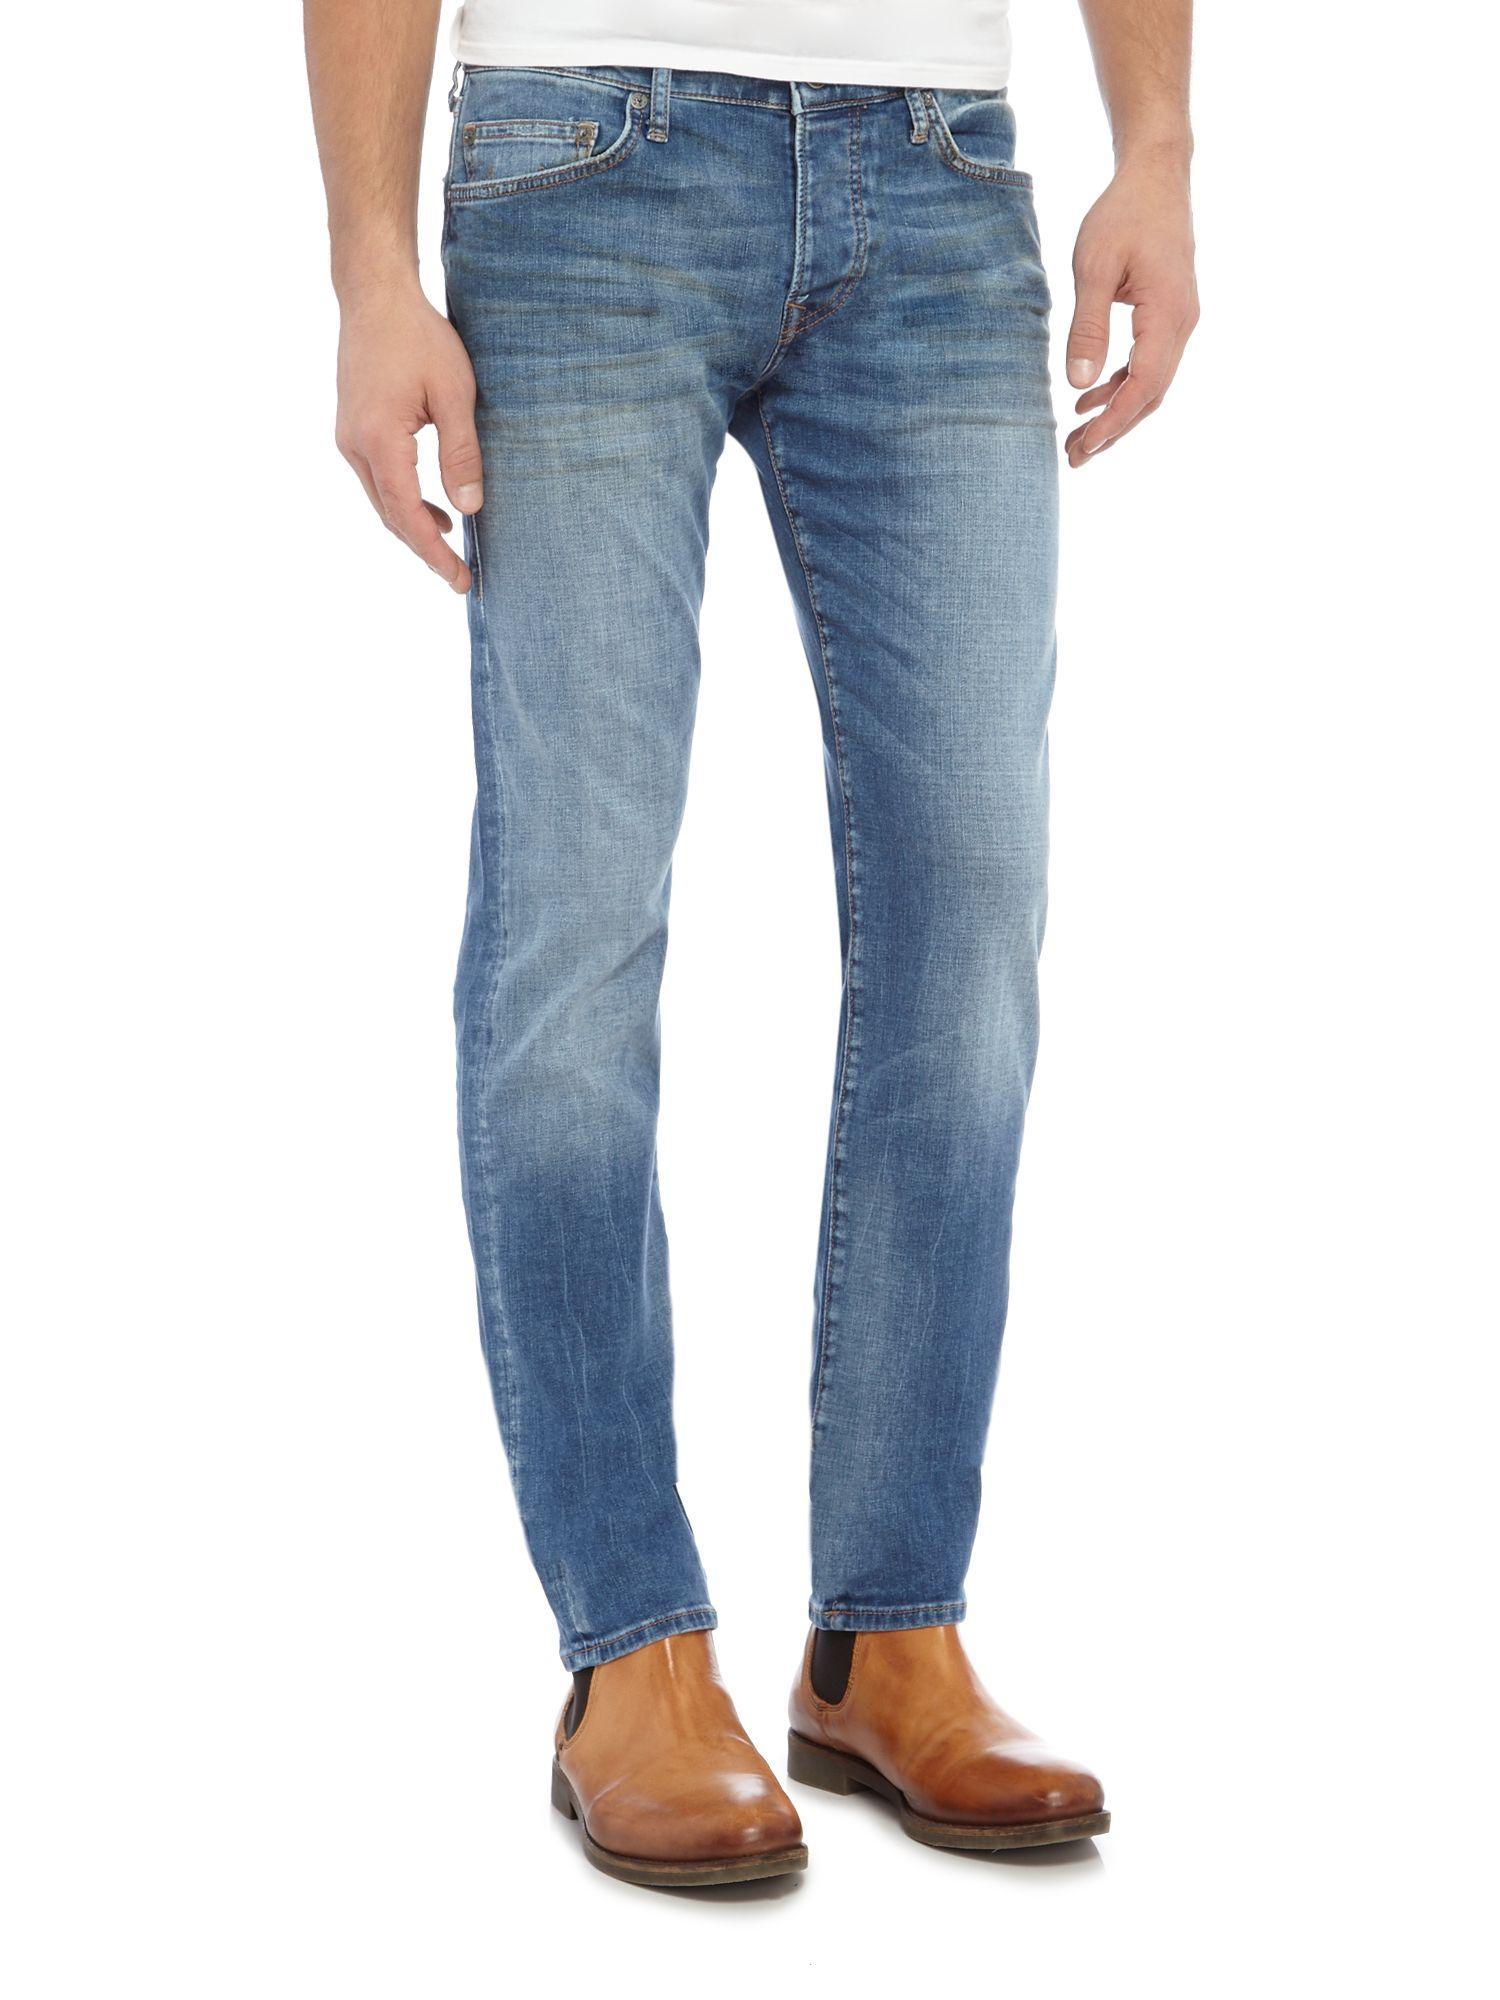 True Religion Denim Rocco Slim Fit Light Wash Jeans in Denim Light Wash (Blue) for Men